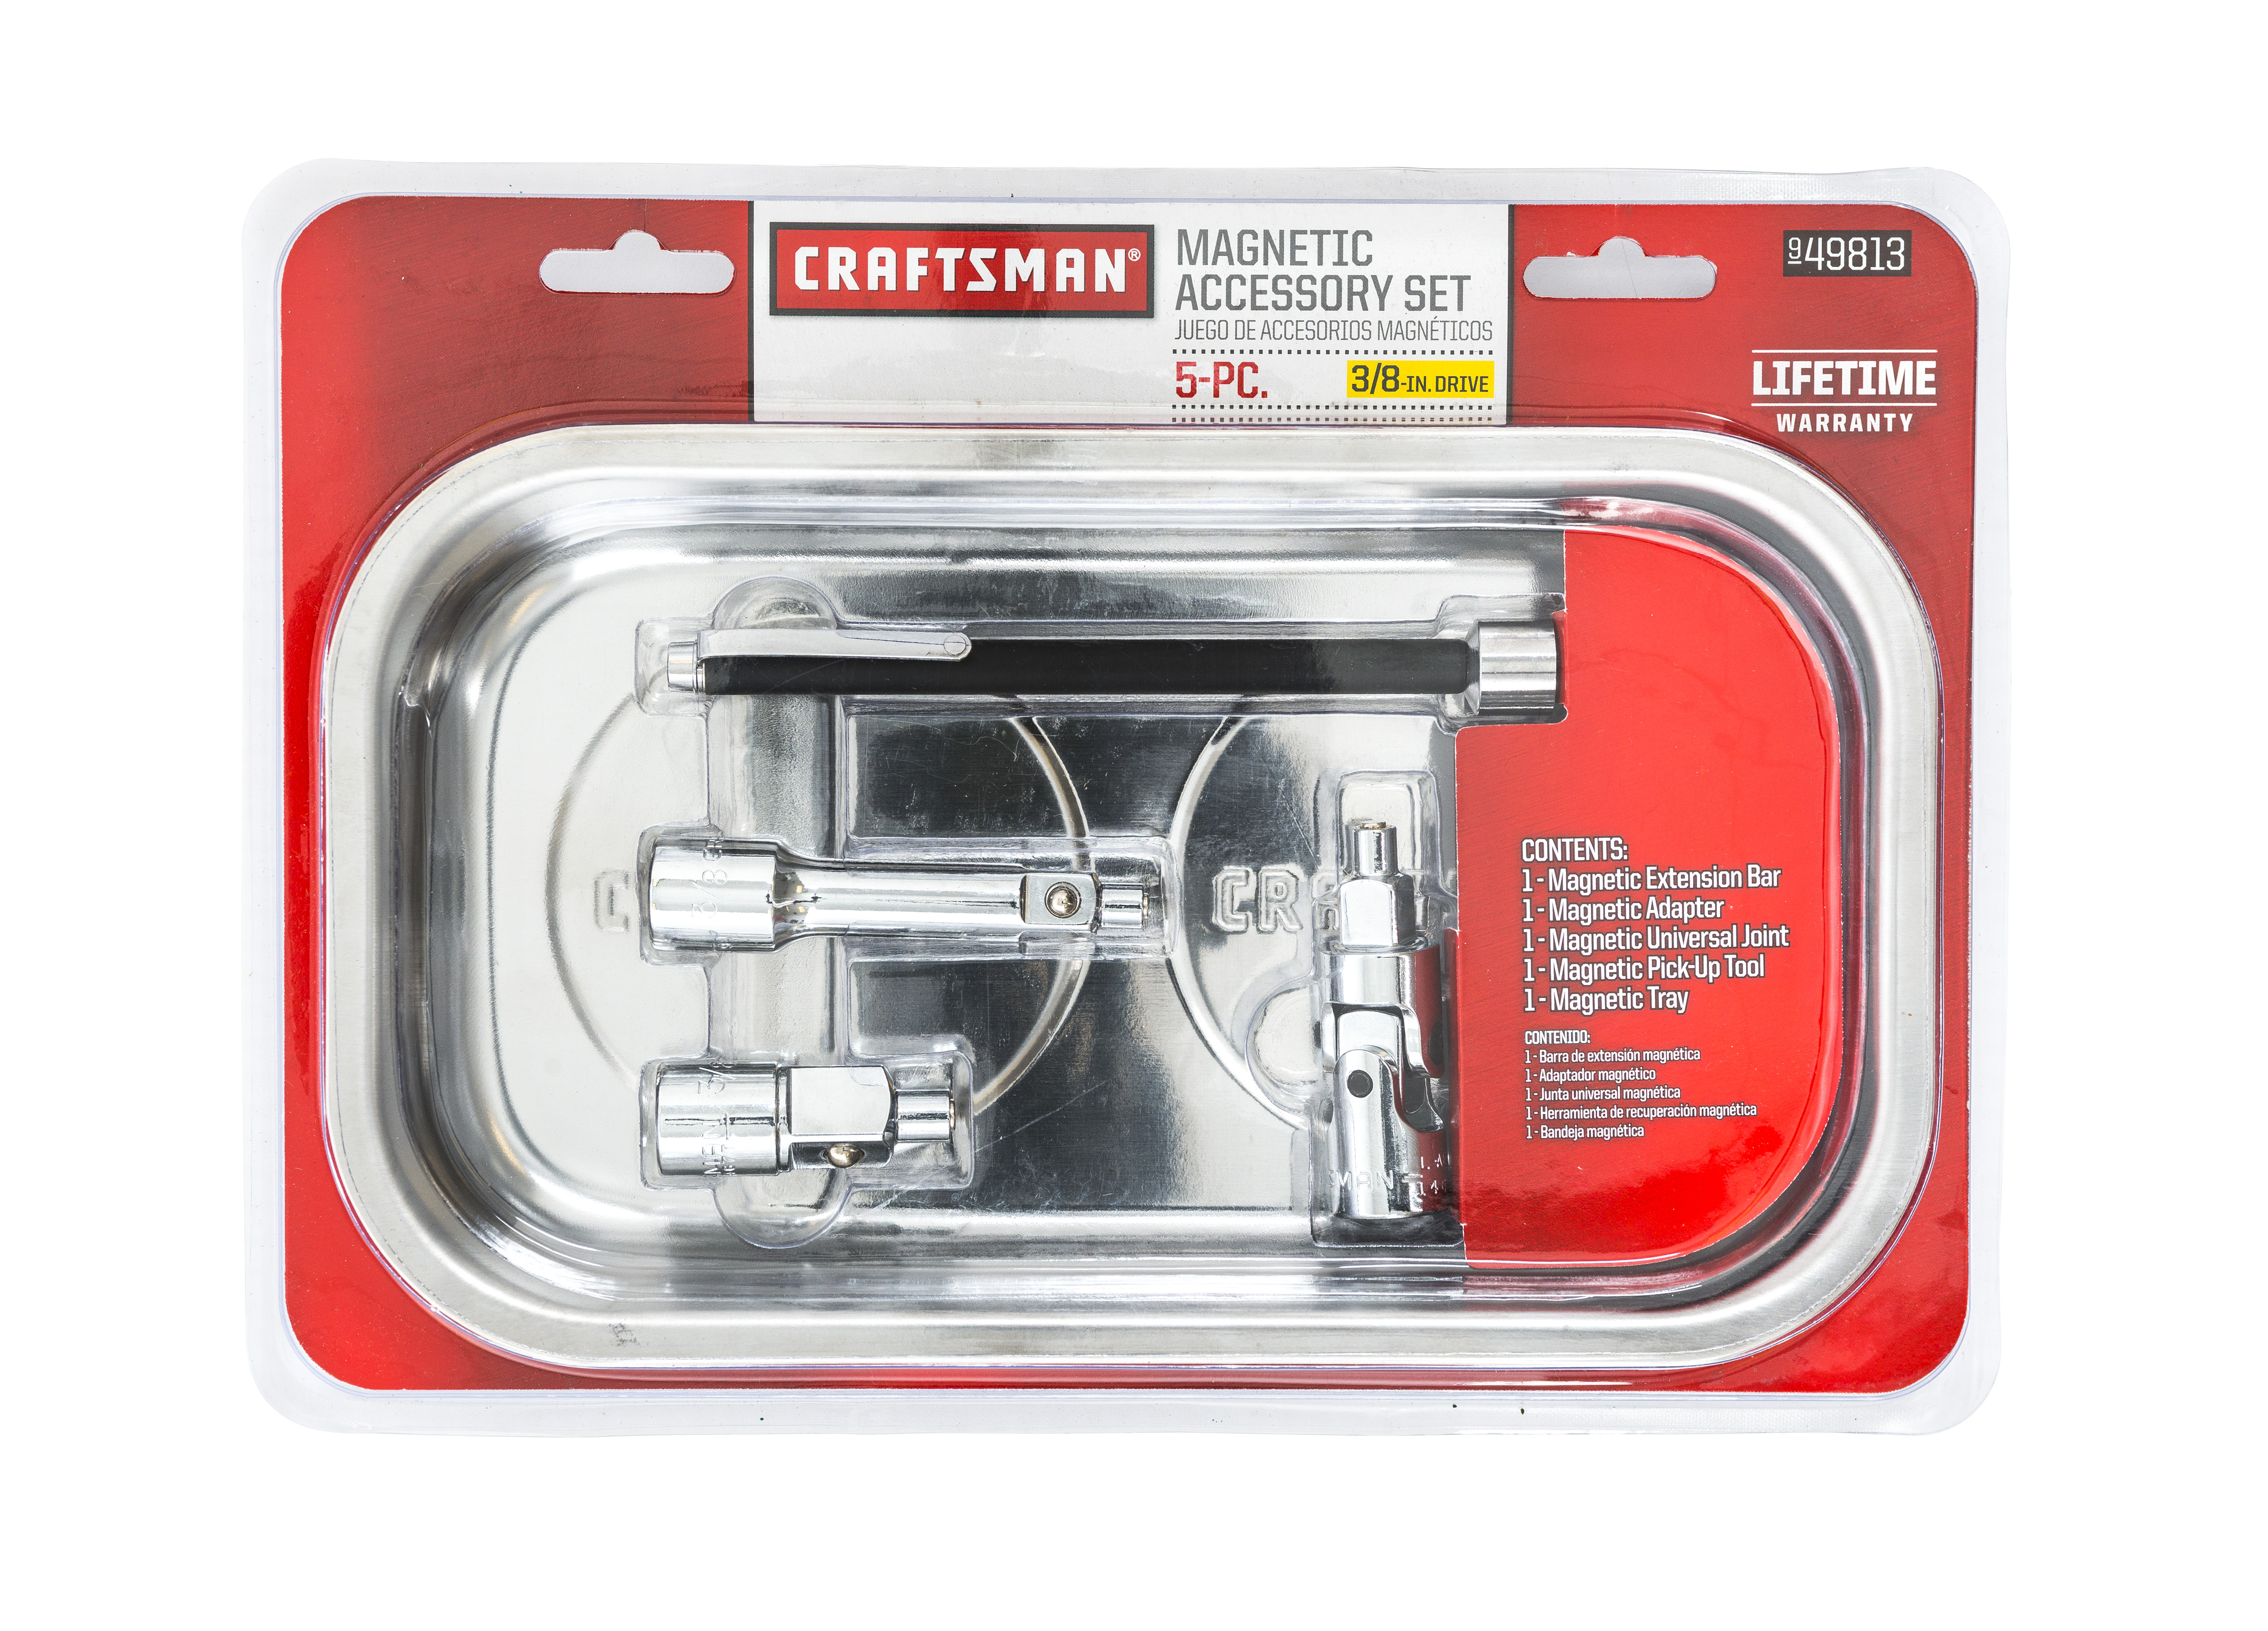 Craftsman 5PC MAGNETIC ACCESSORY SET